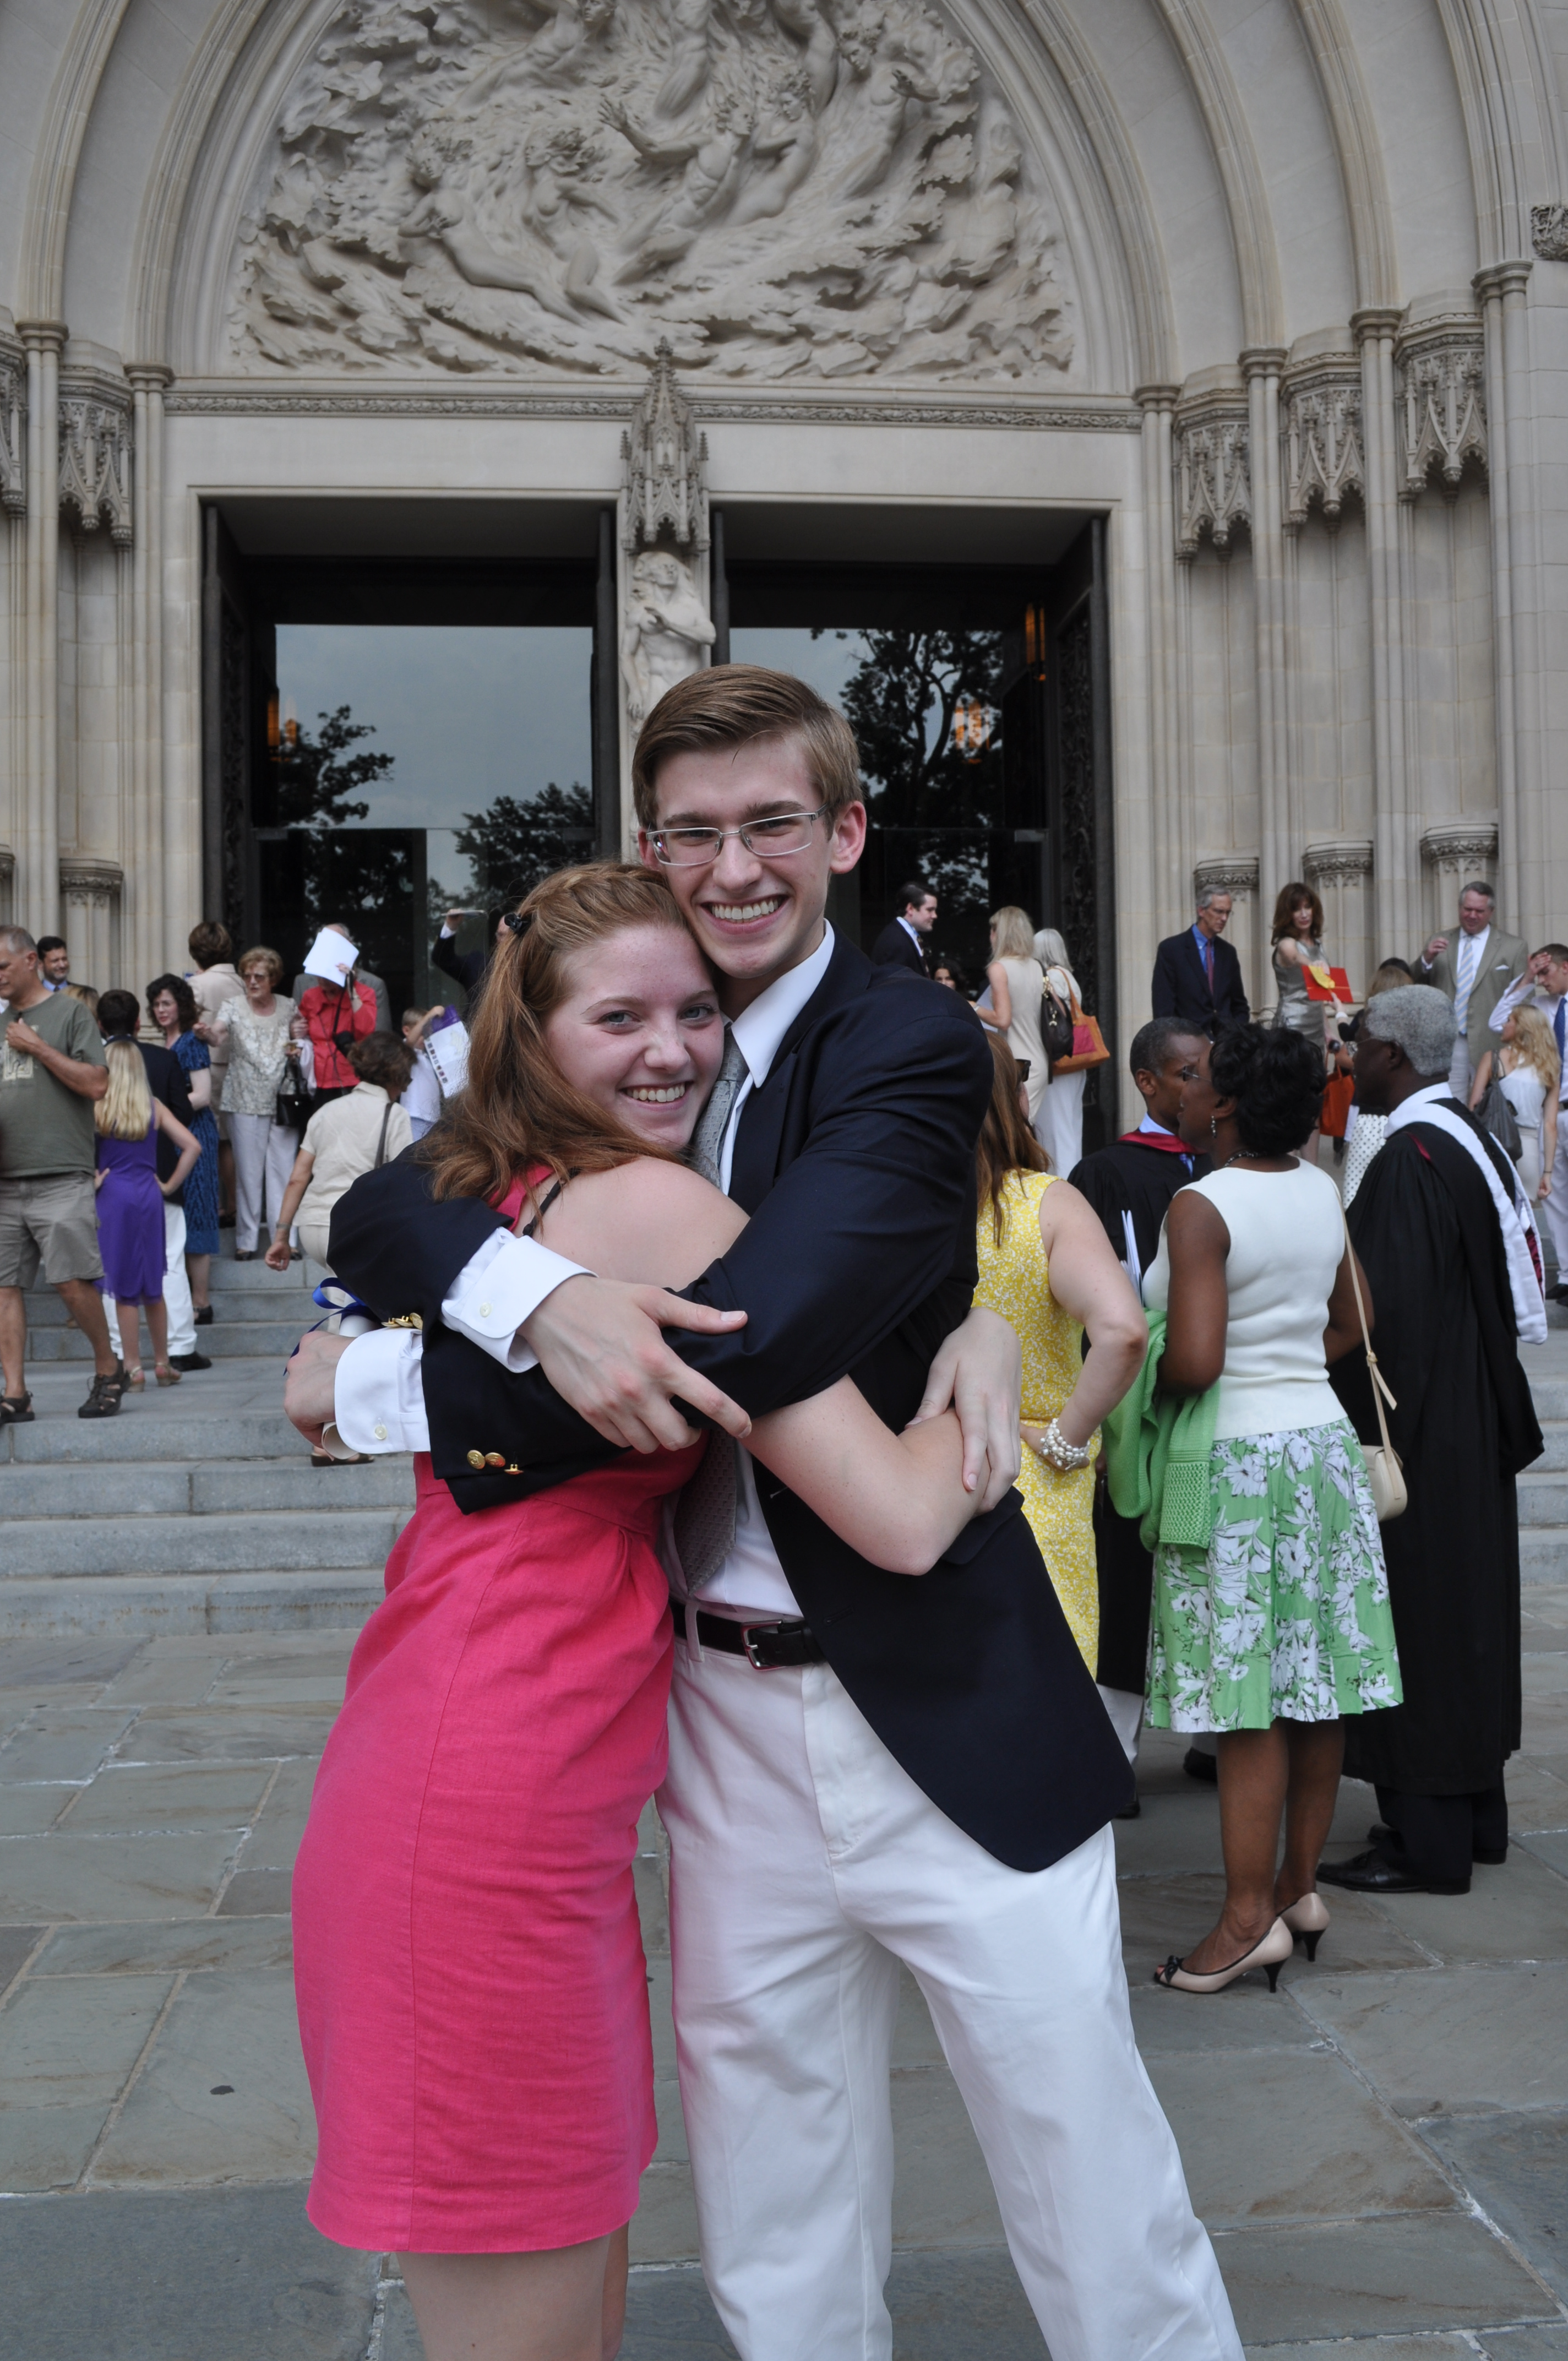 Andrew's High School Graduation